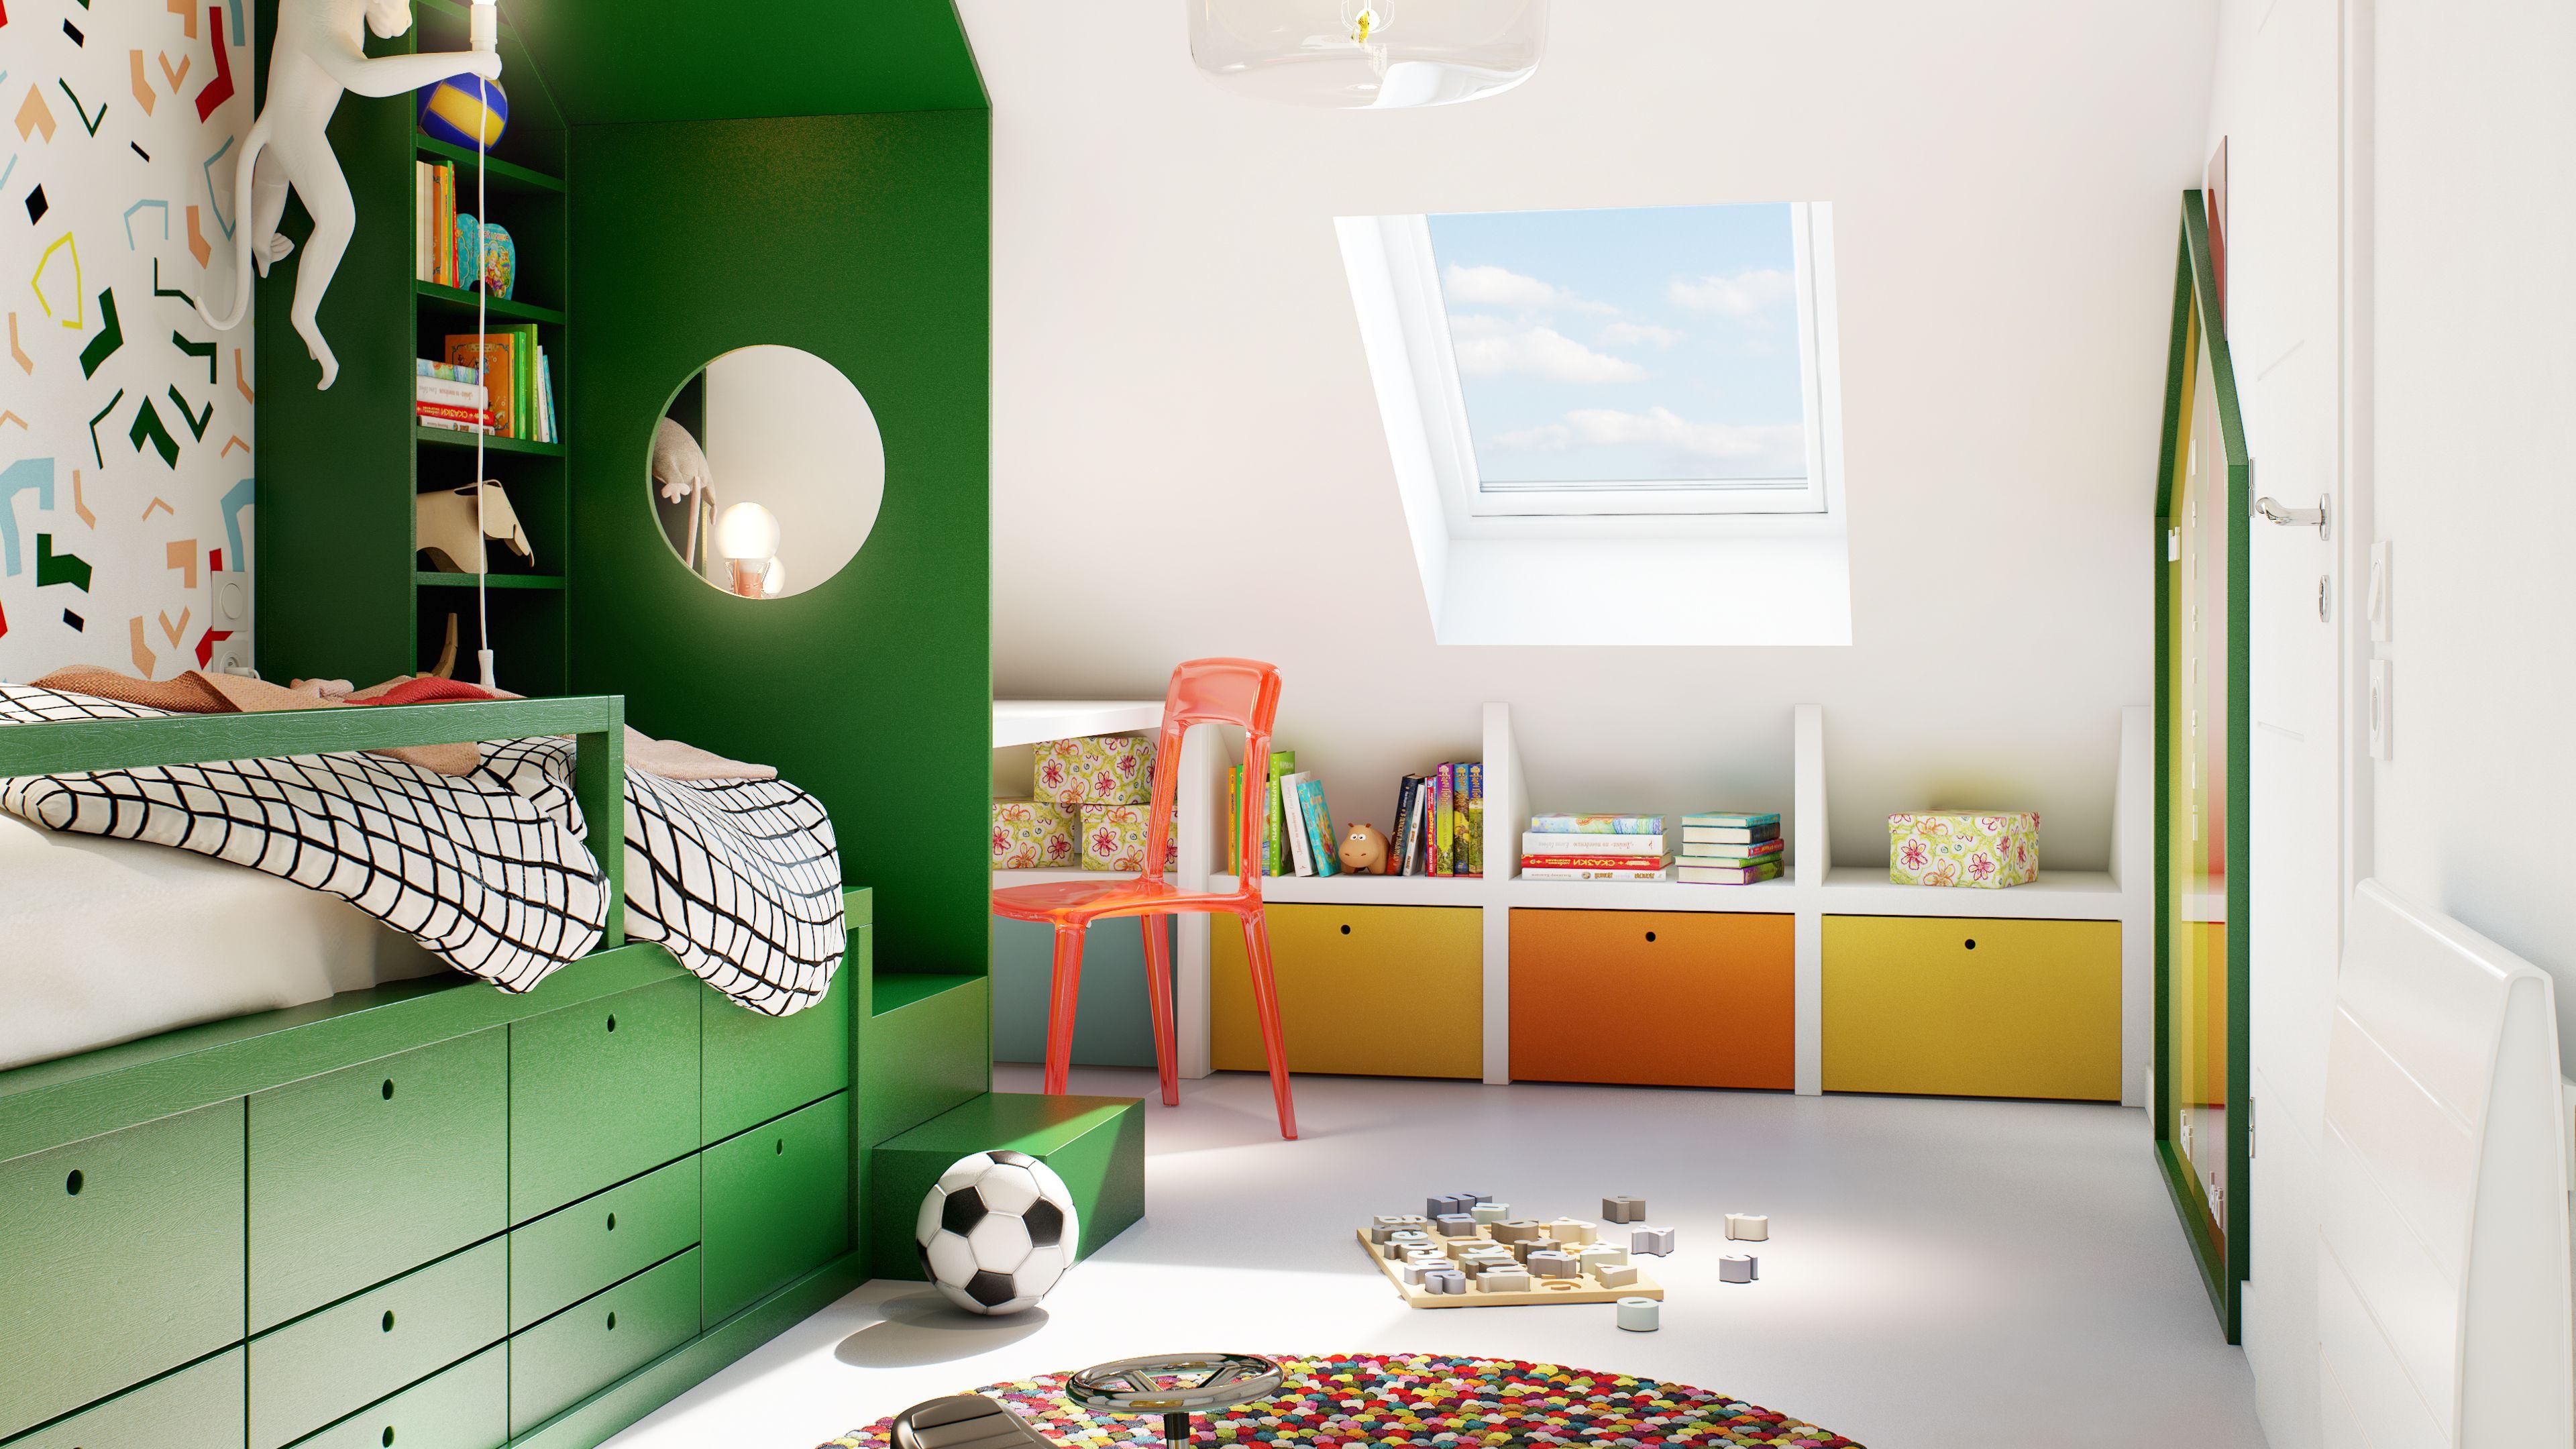 Une Chambre De Garcon Design De Chambre Mansardee Deco Chambre